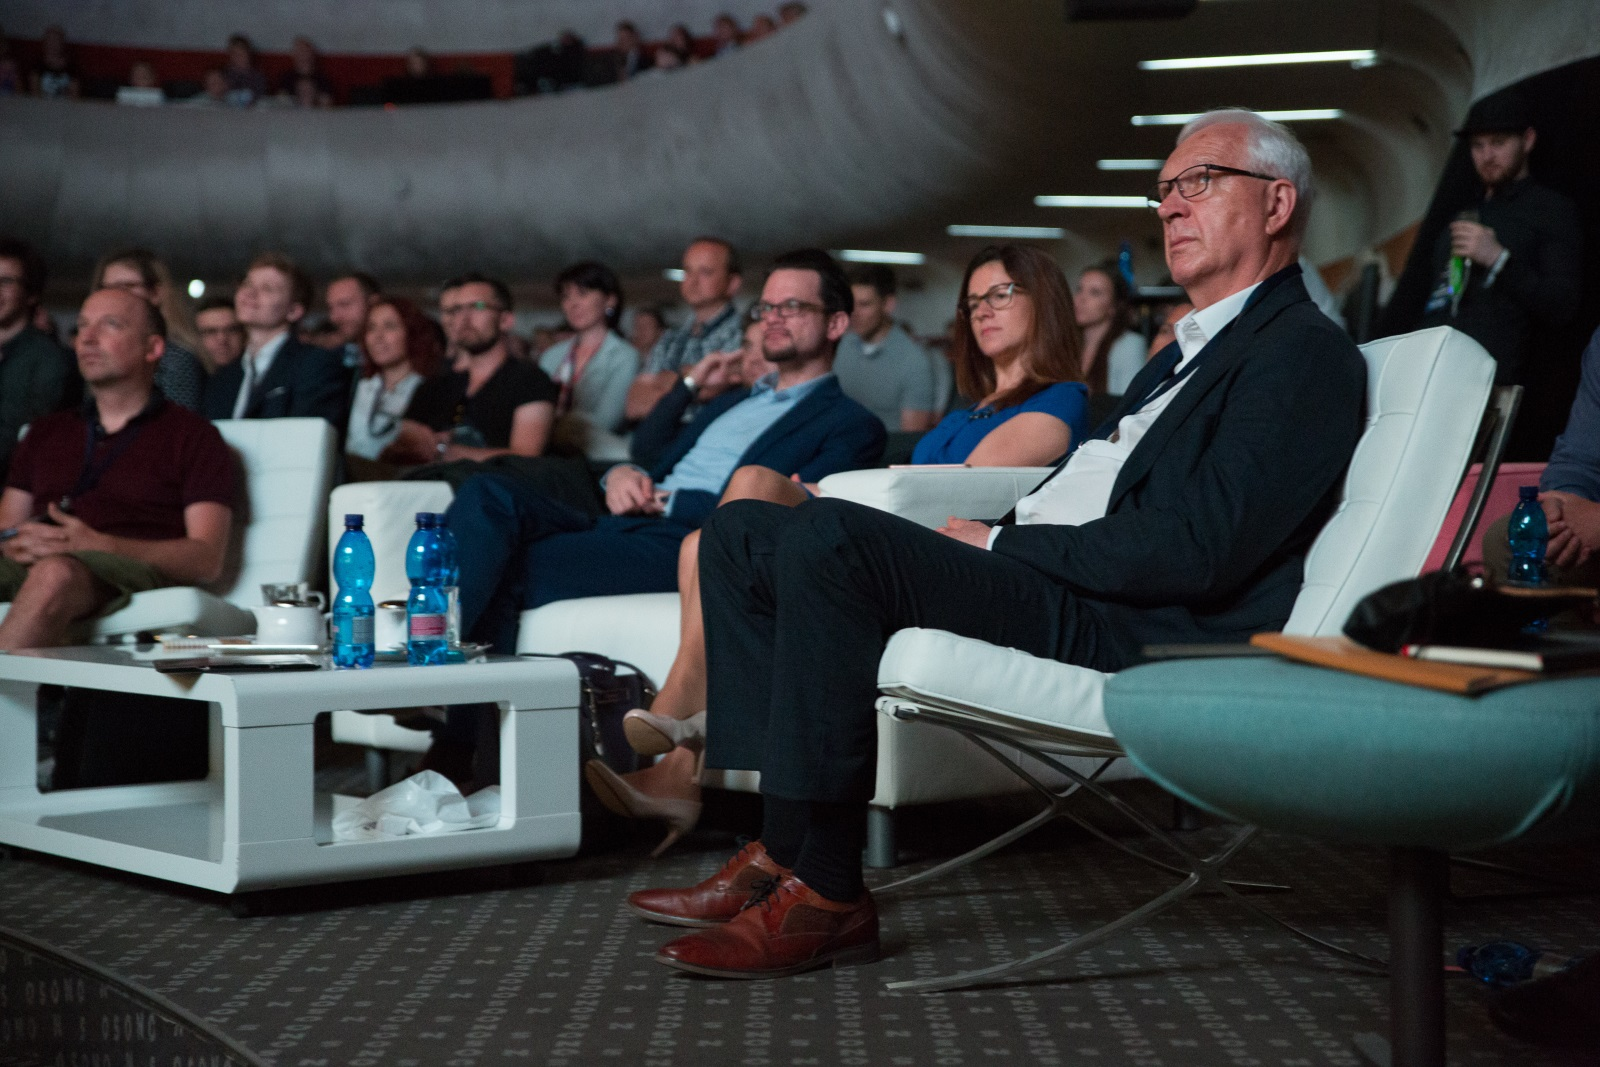 Jiří Drahoš a publikum na konferenci Glorious